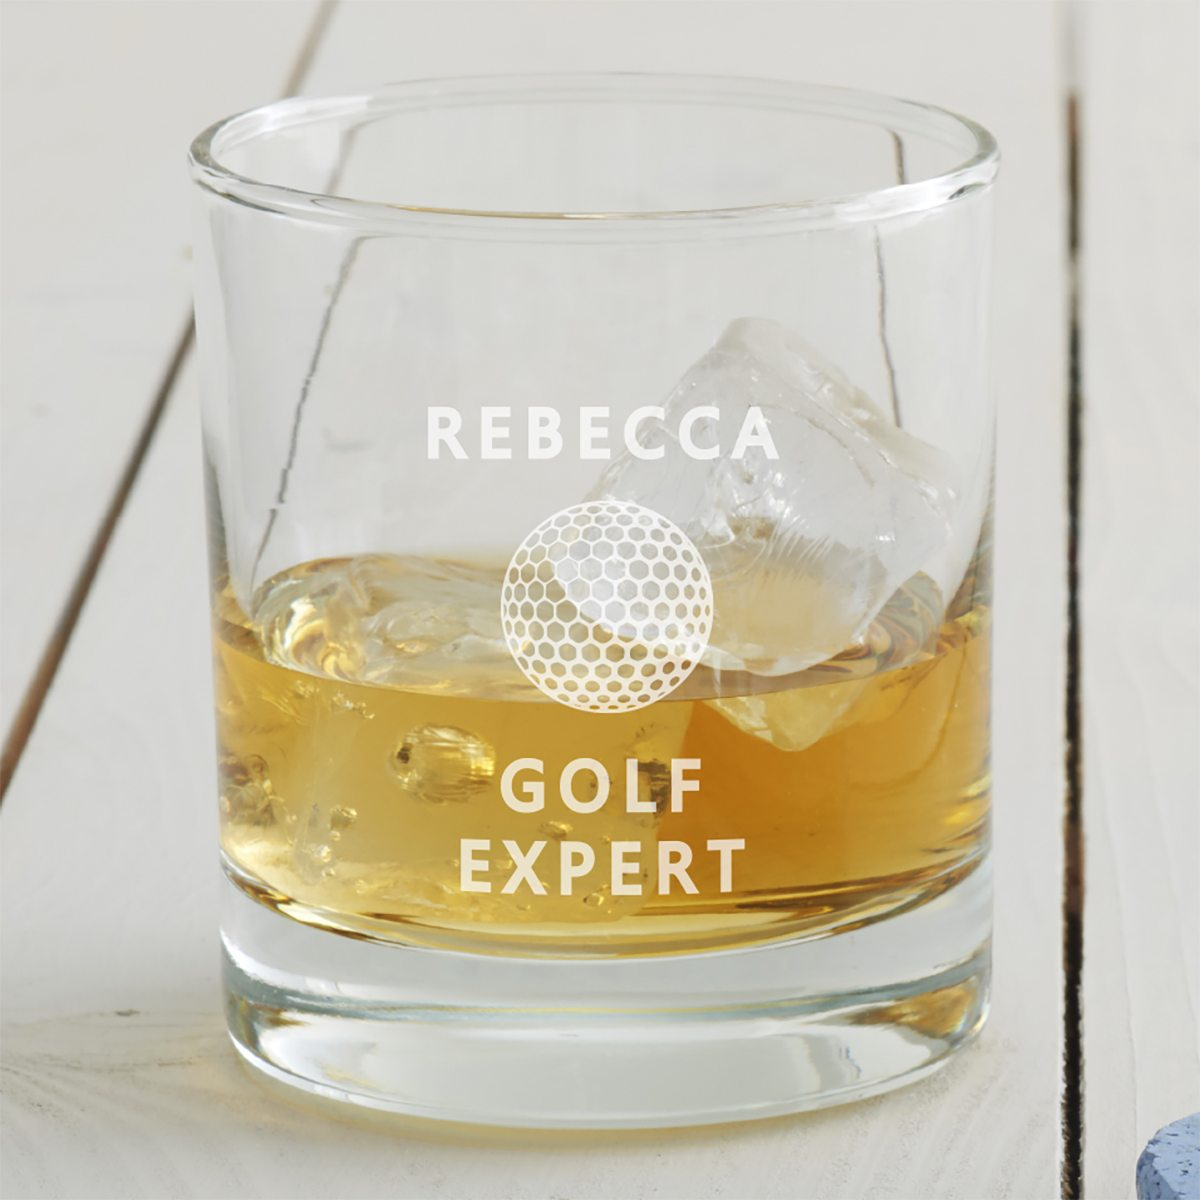 Personalised Golf Tumbler Glass